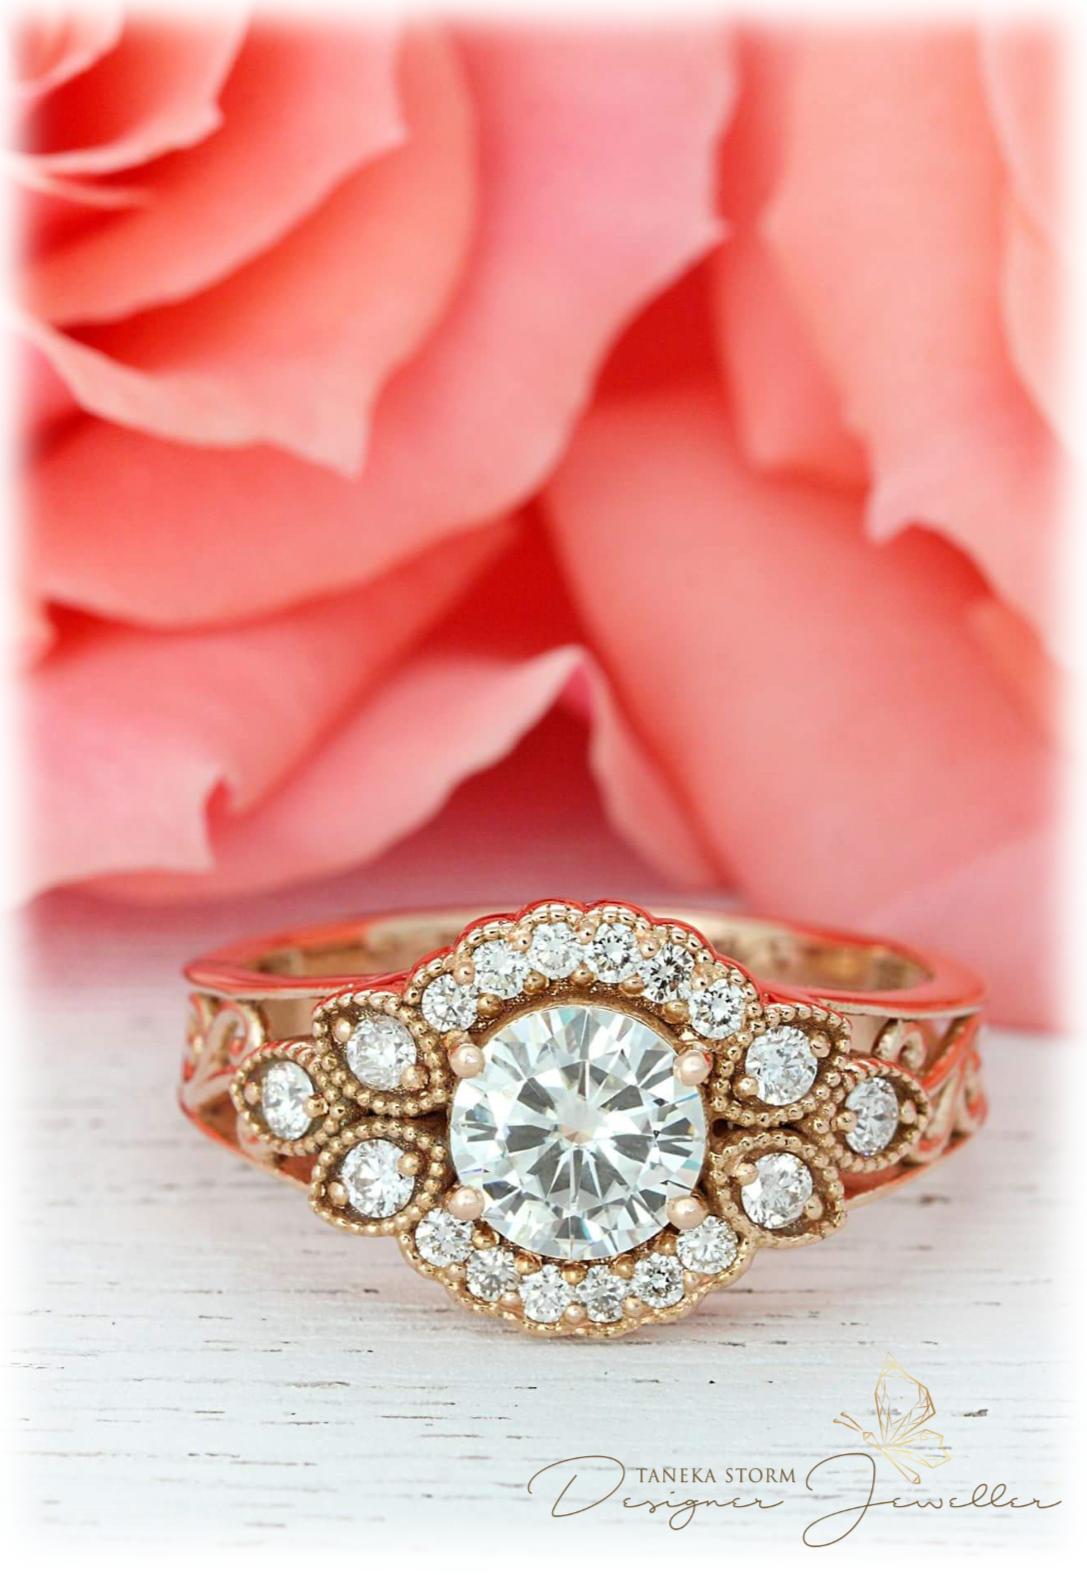 Romance in full bloom. | Jewellery by Taneka Storm | Pinterest